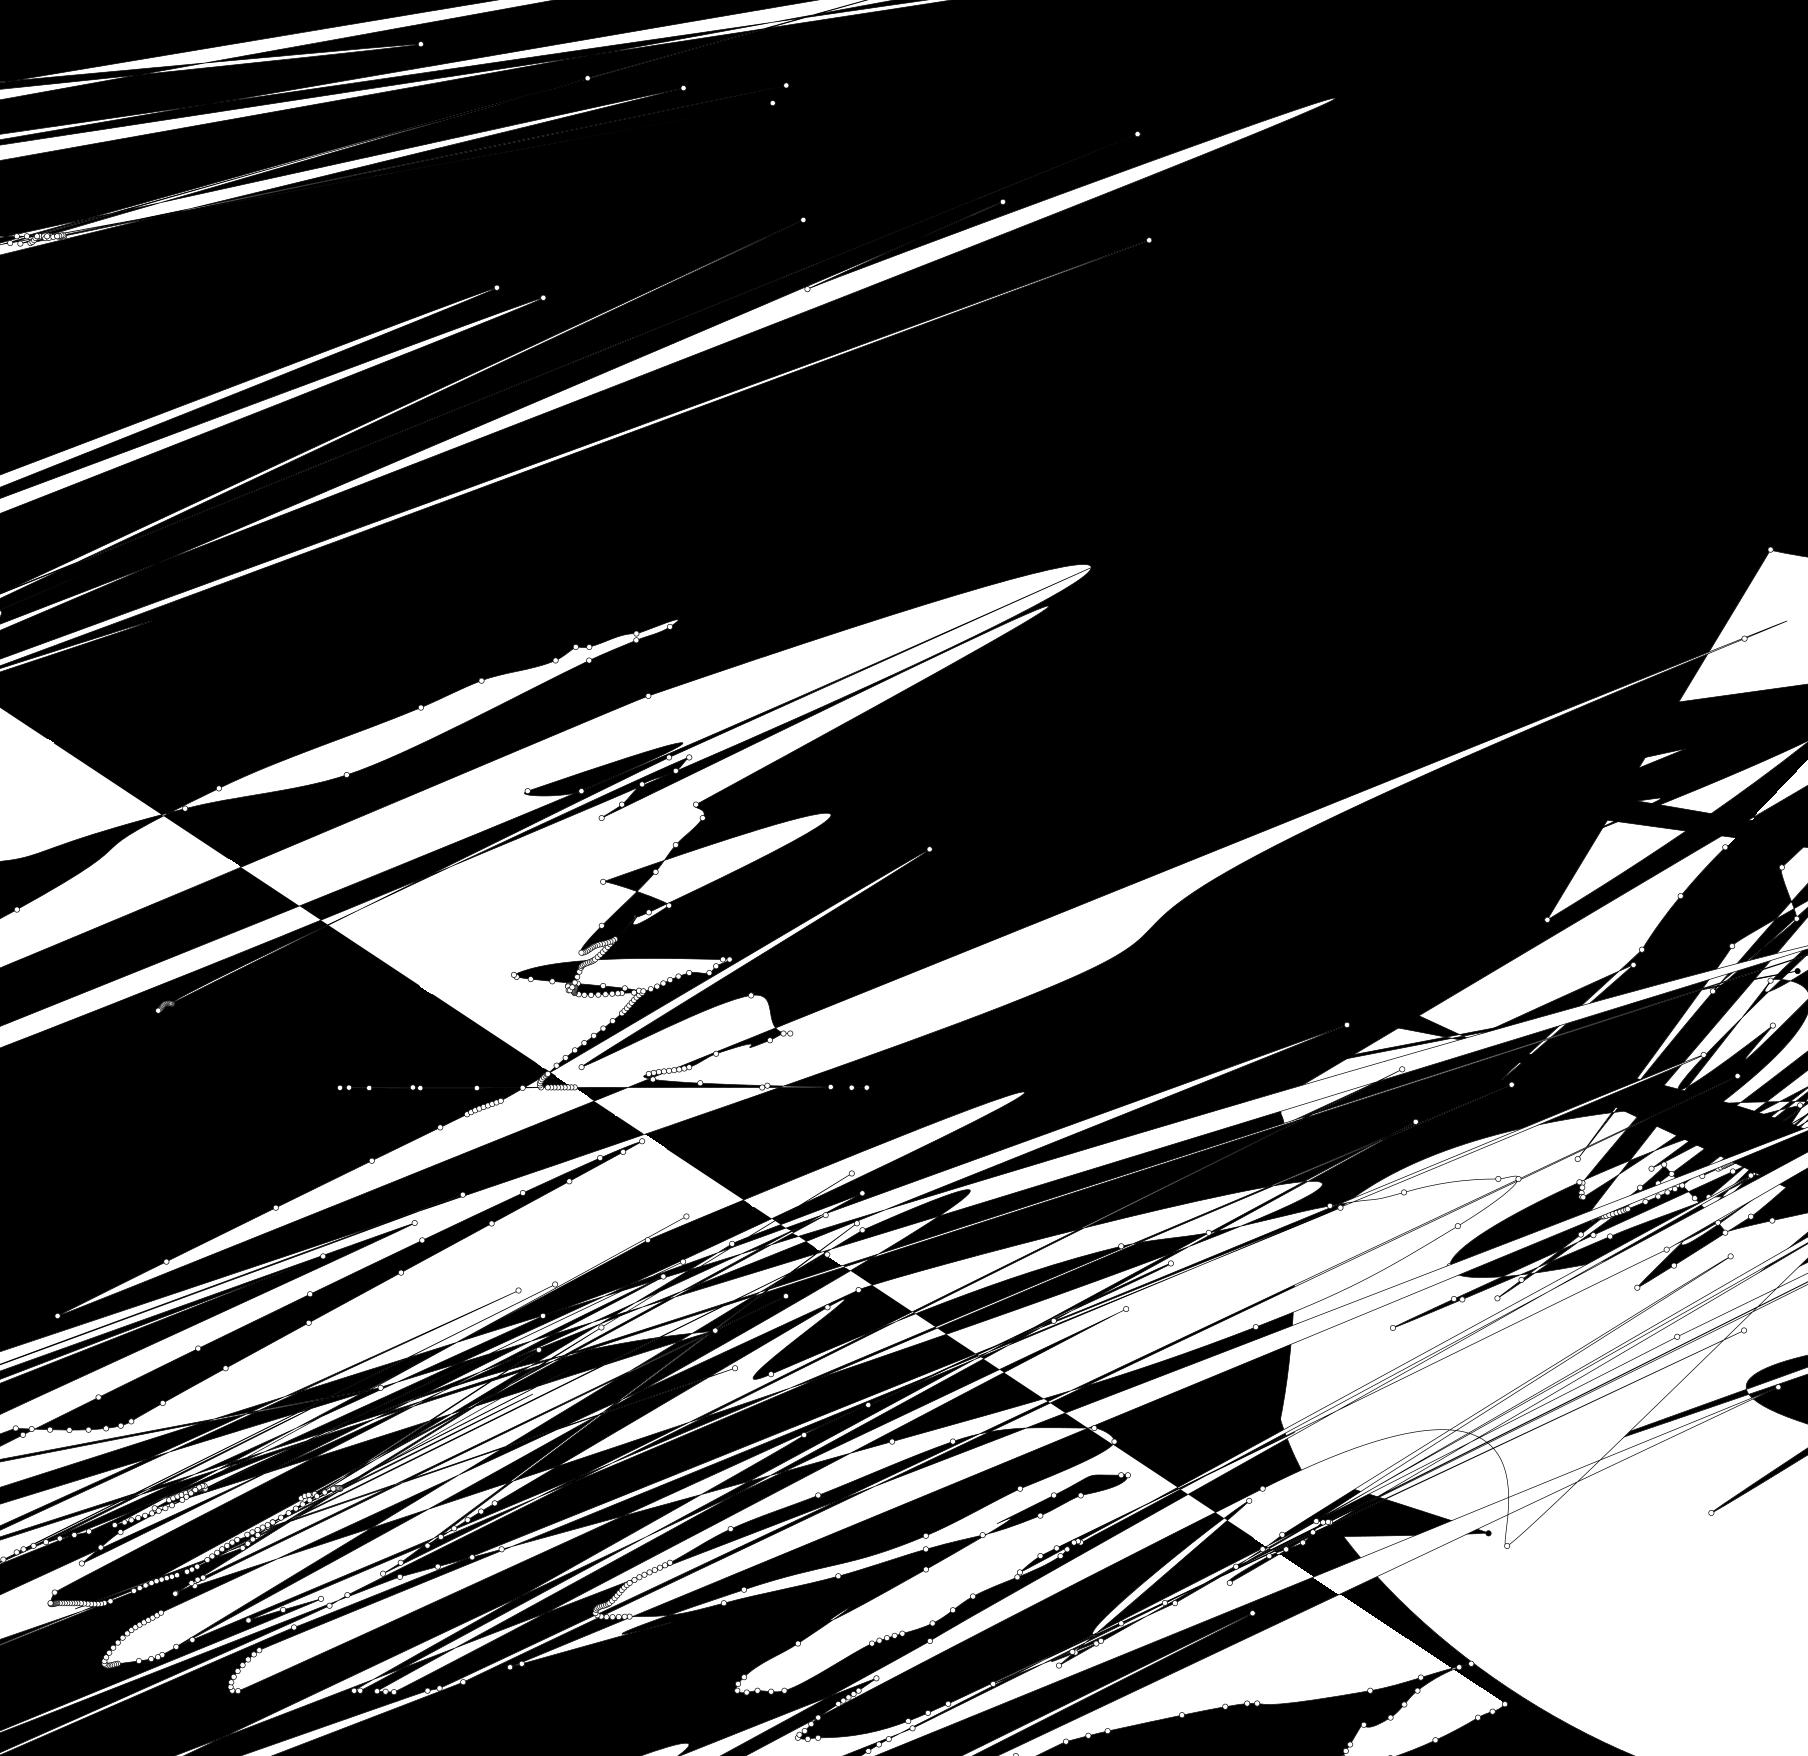 dg2.0 drawing #02